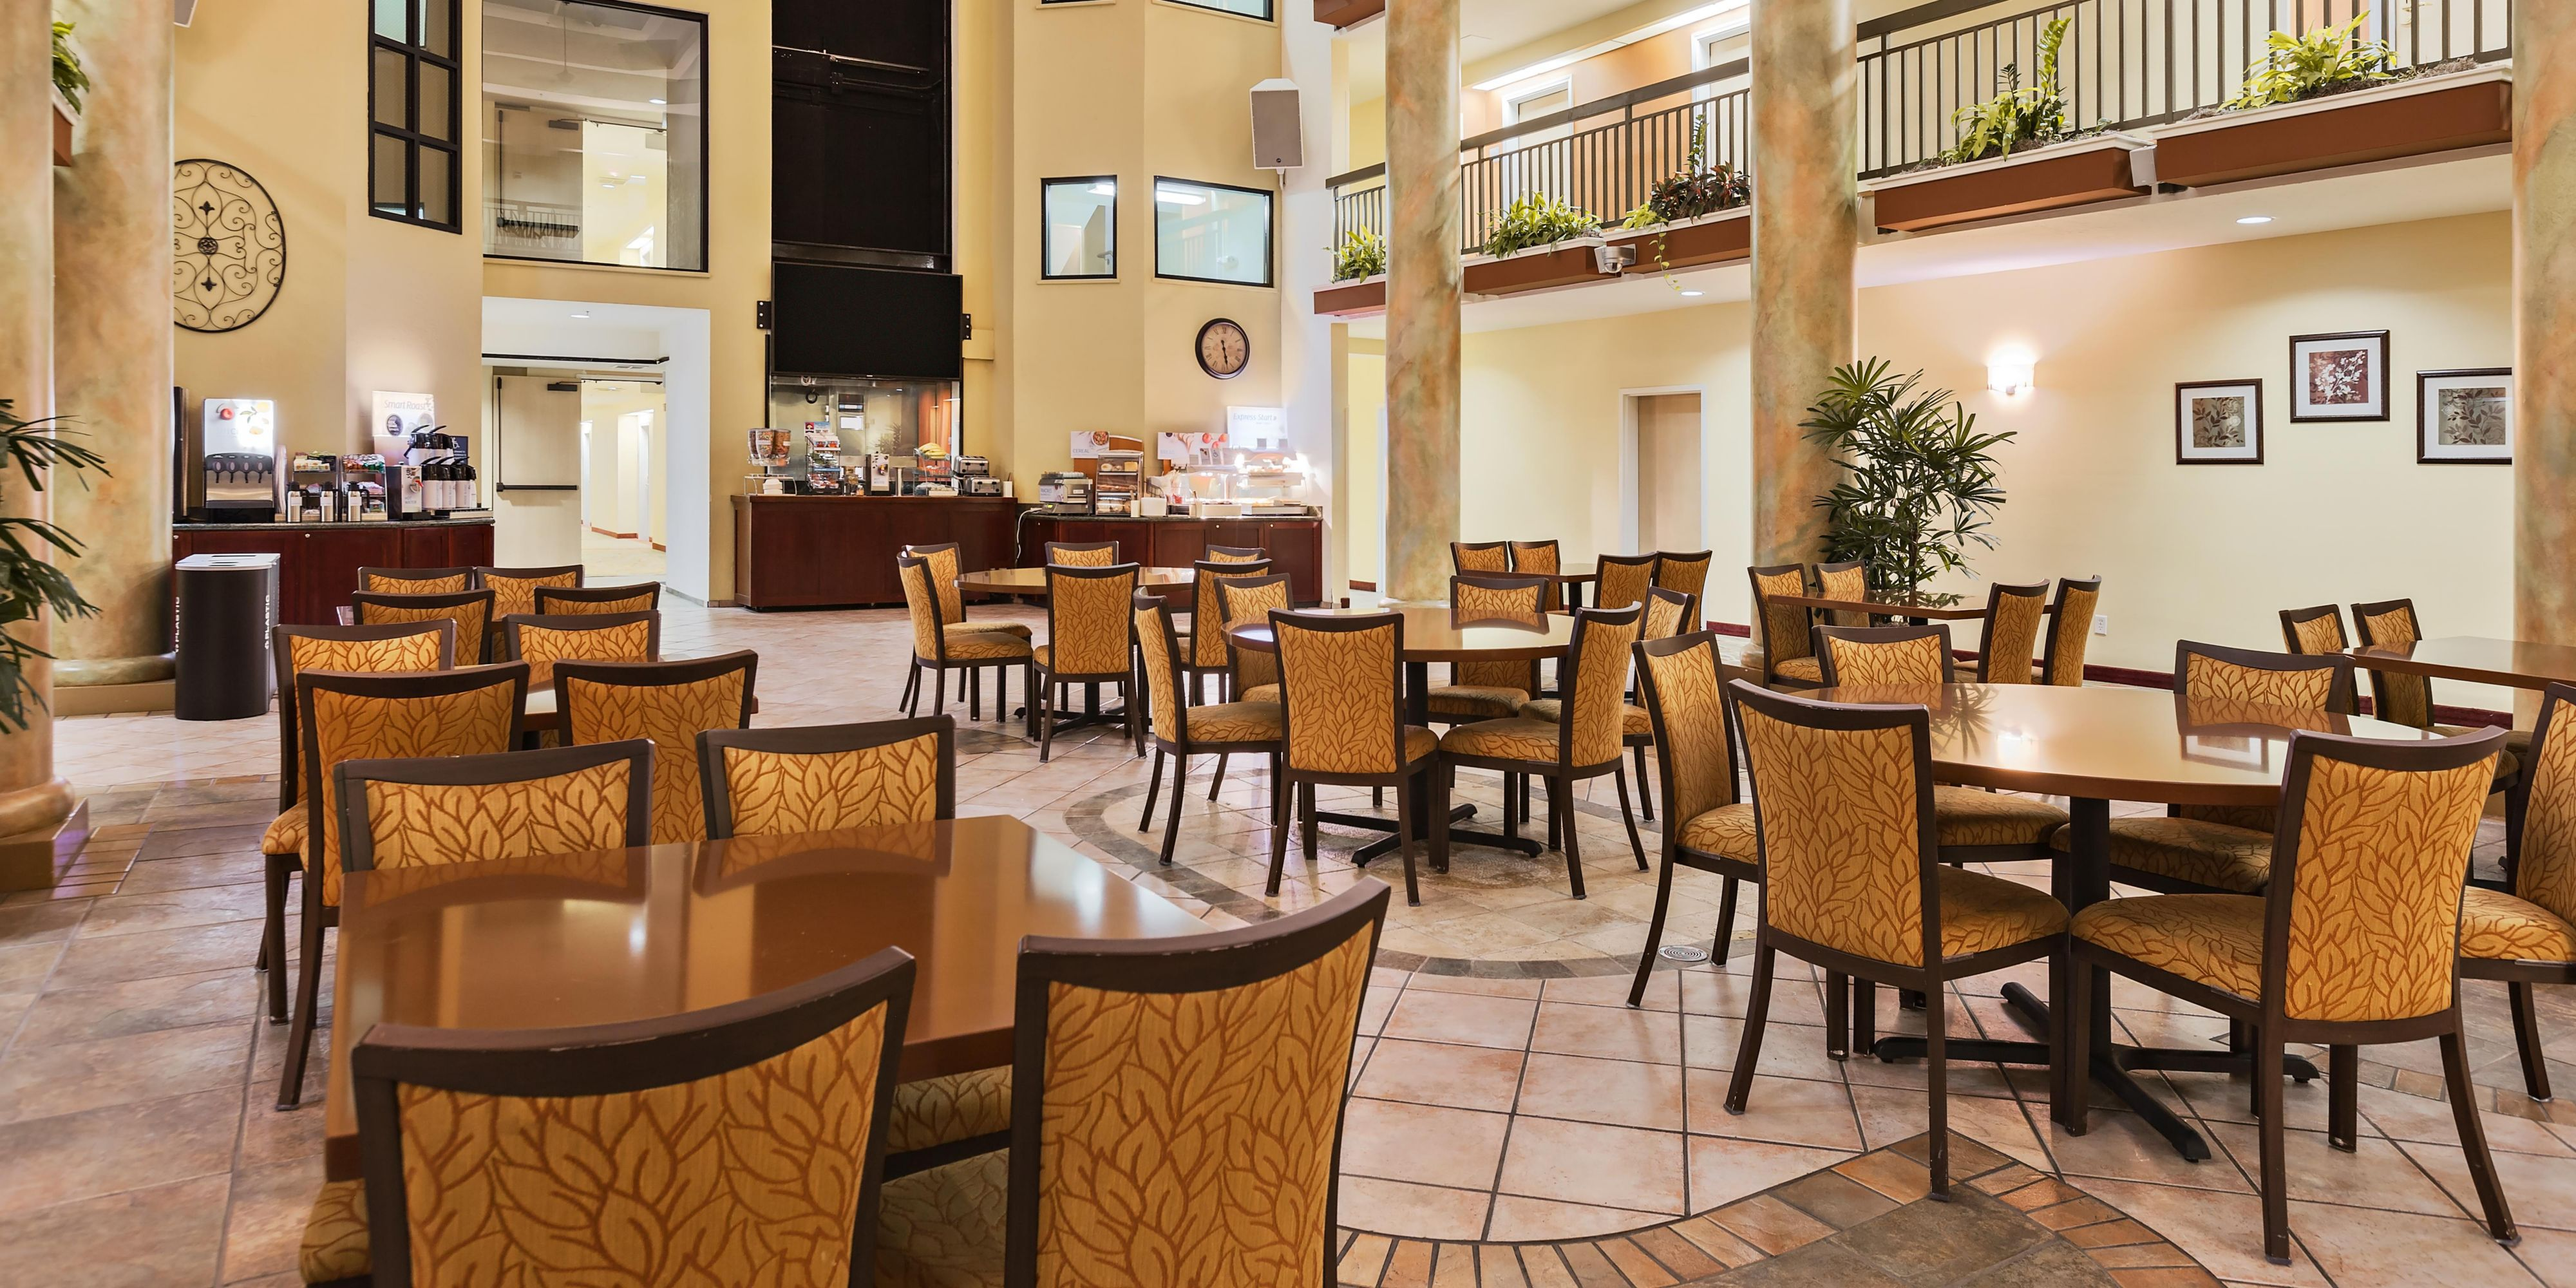 Holiday Inn Express & Suites San Jose-Morgan Hill Hotel by IHG